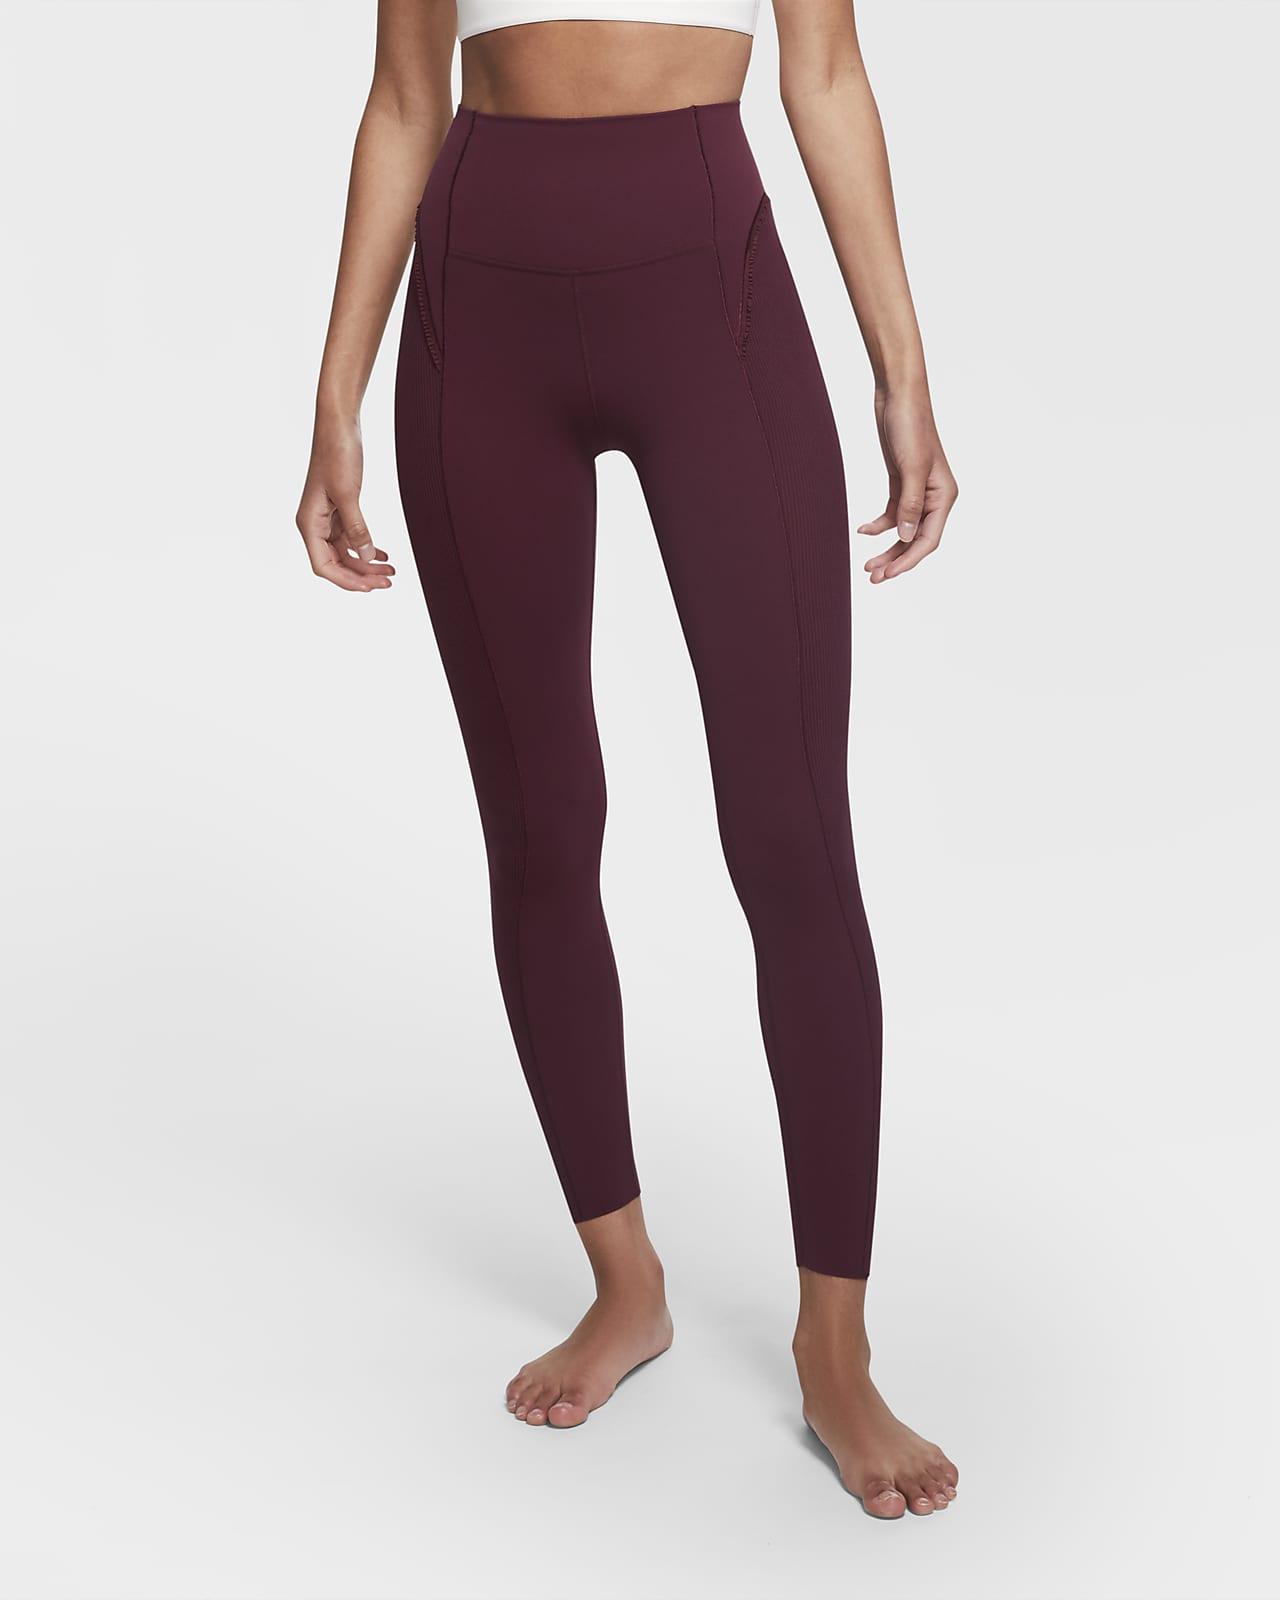 Nike Yoga Luxe Women's Infinalon Ruffled 7/8 Tights